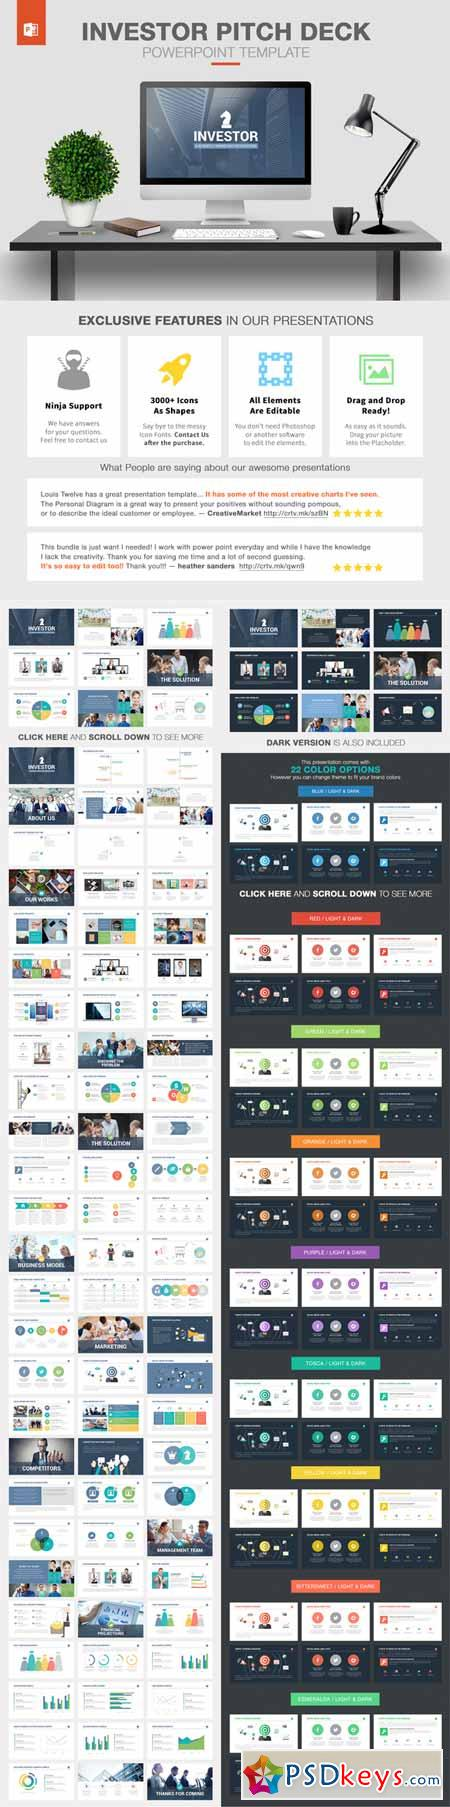 investor pitch deck powerpoint 225853 » free download photoshop, Modern powerpoint